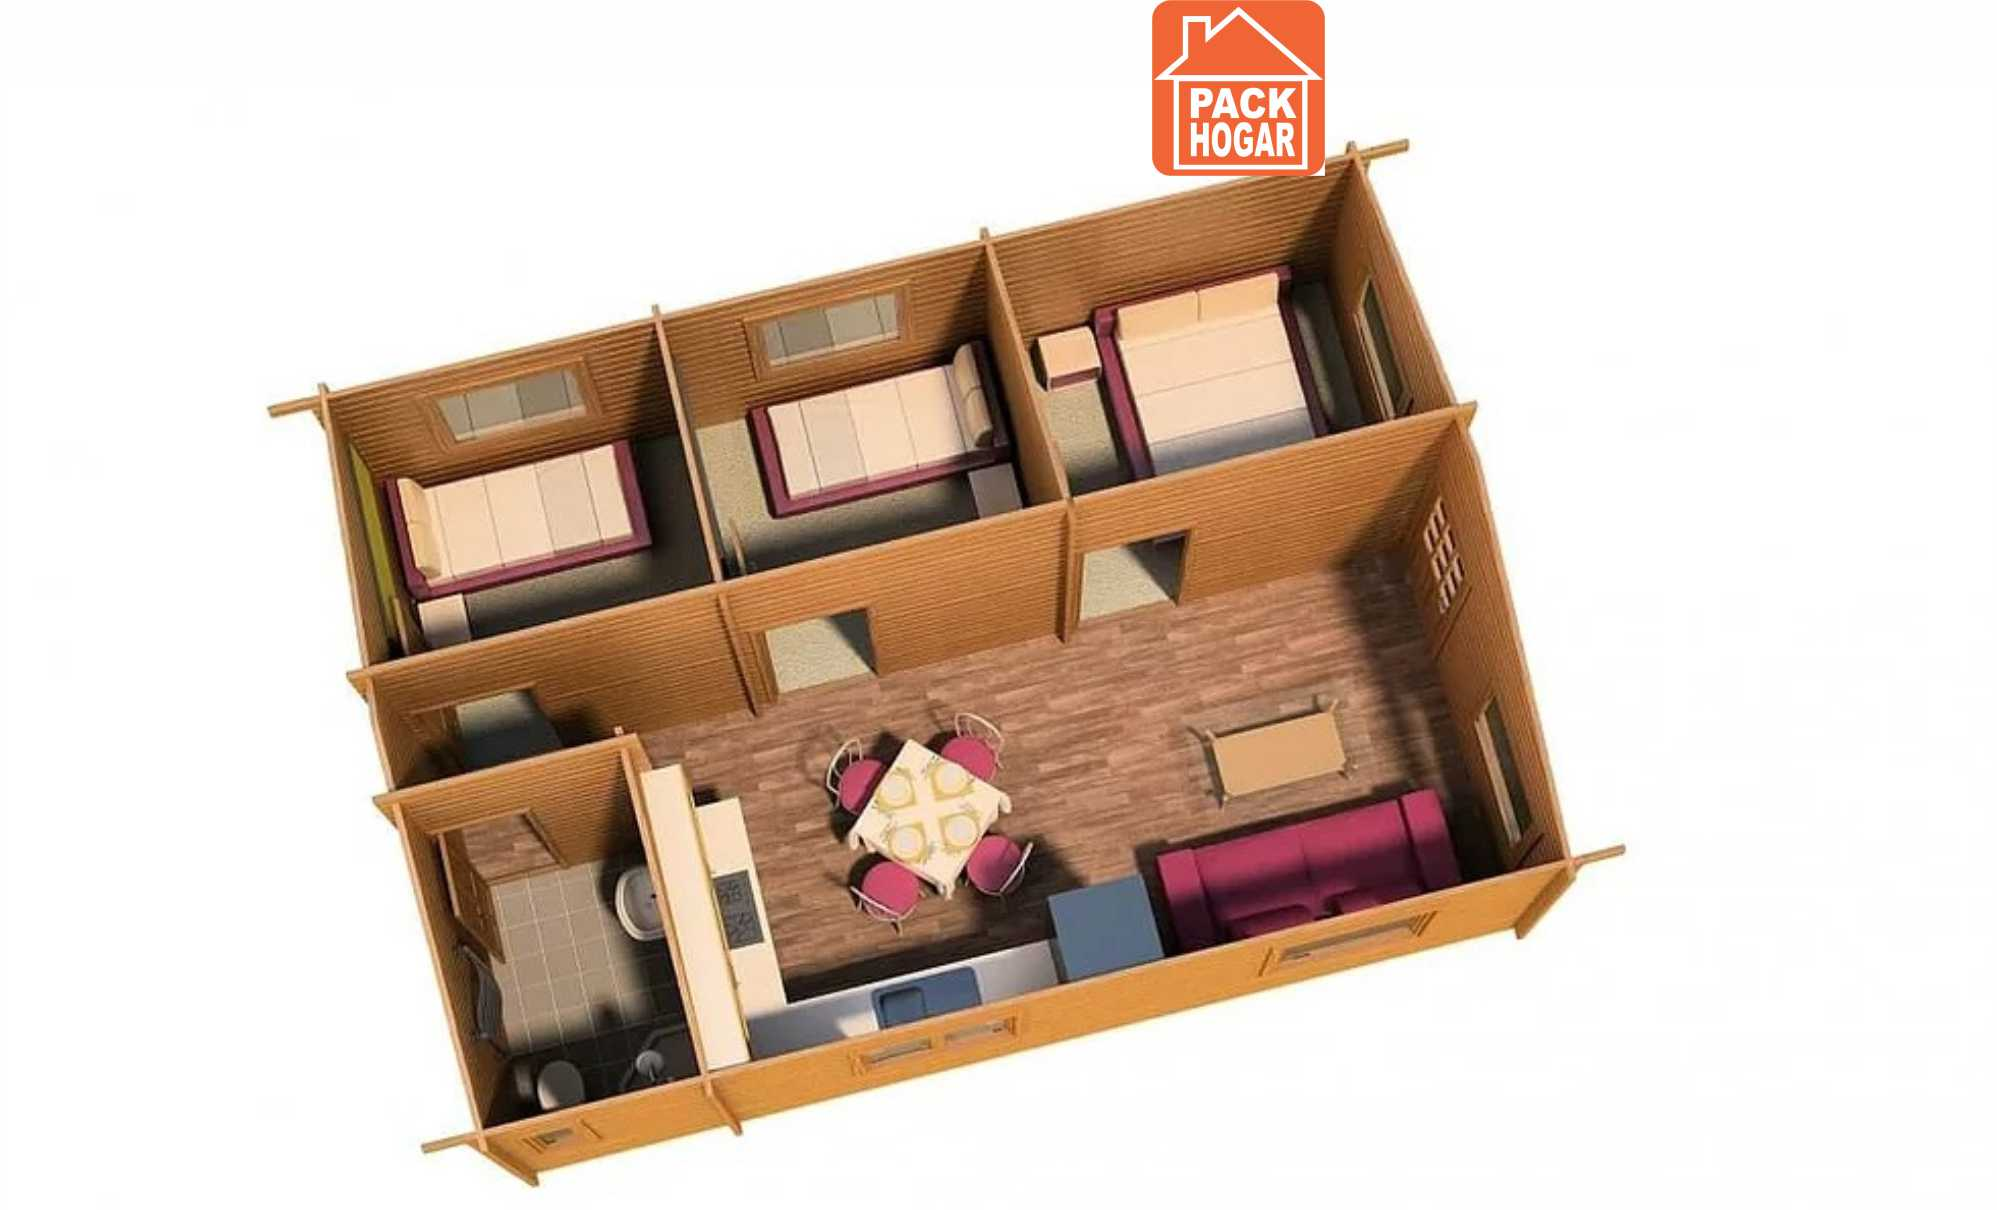 plano para casas prefabricadas de madera con tres dormitorios